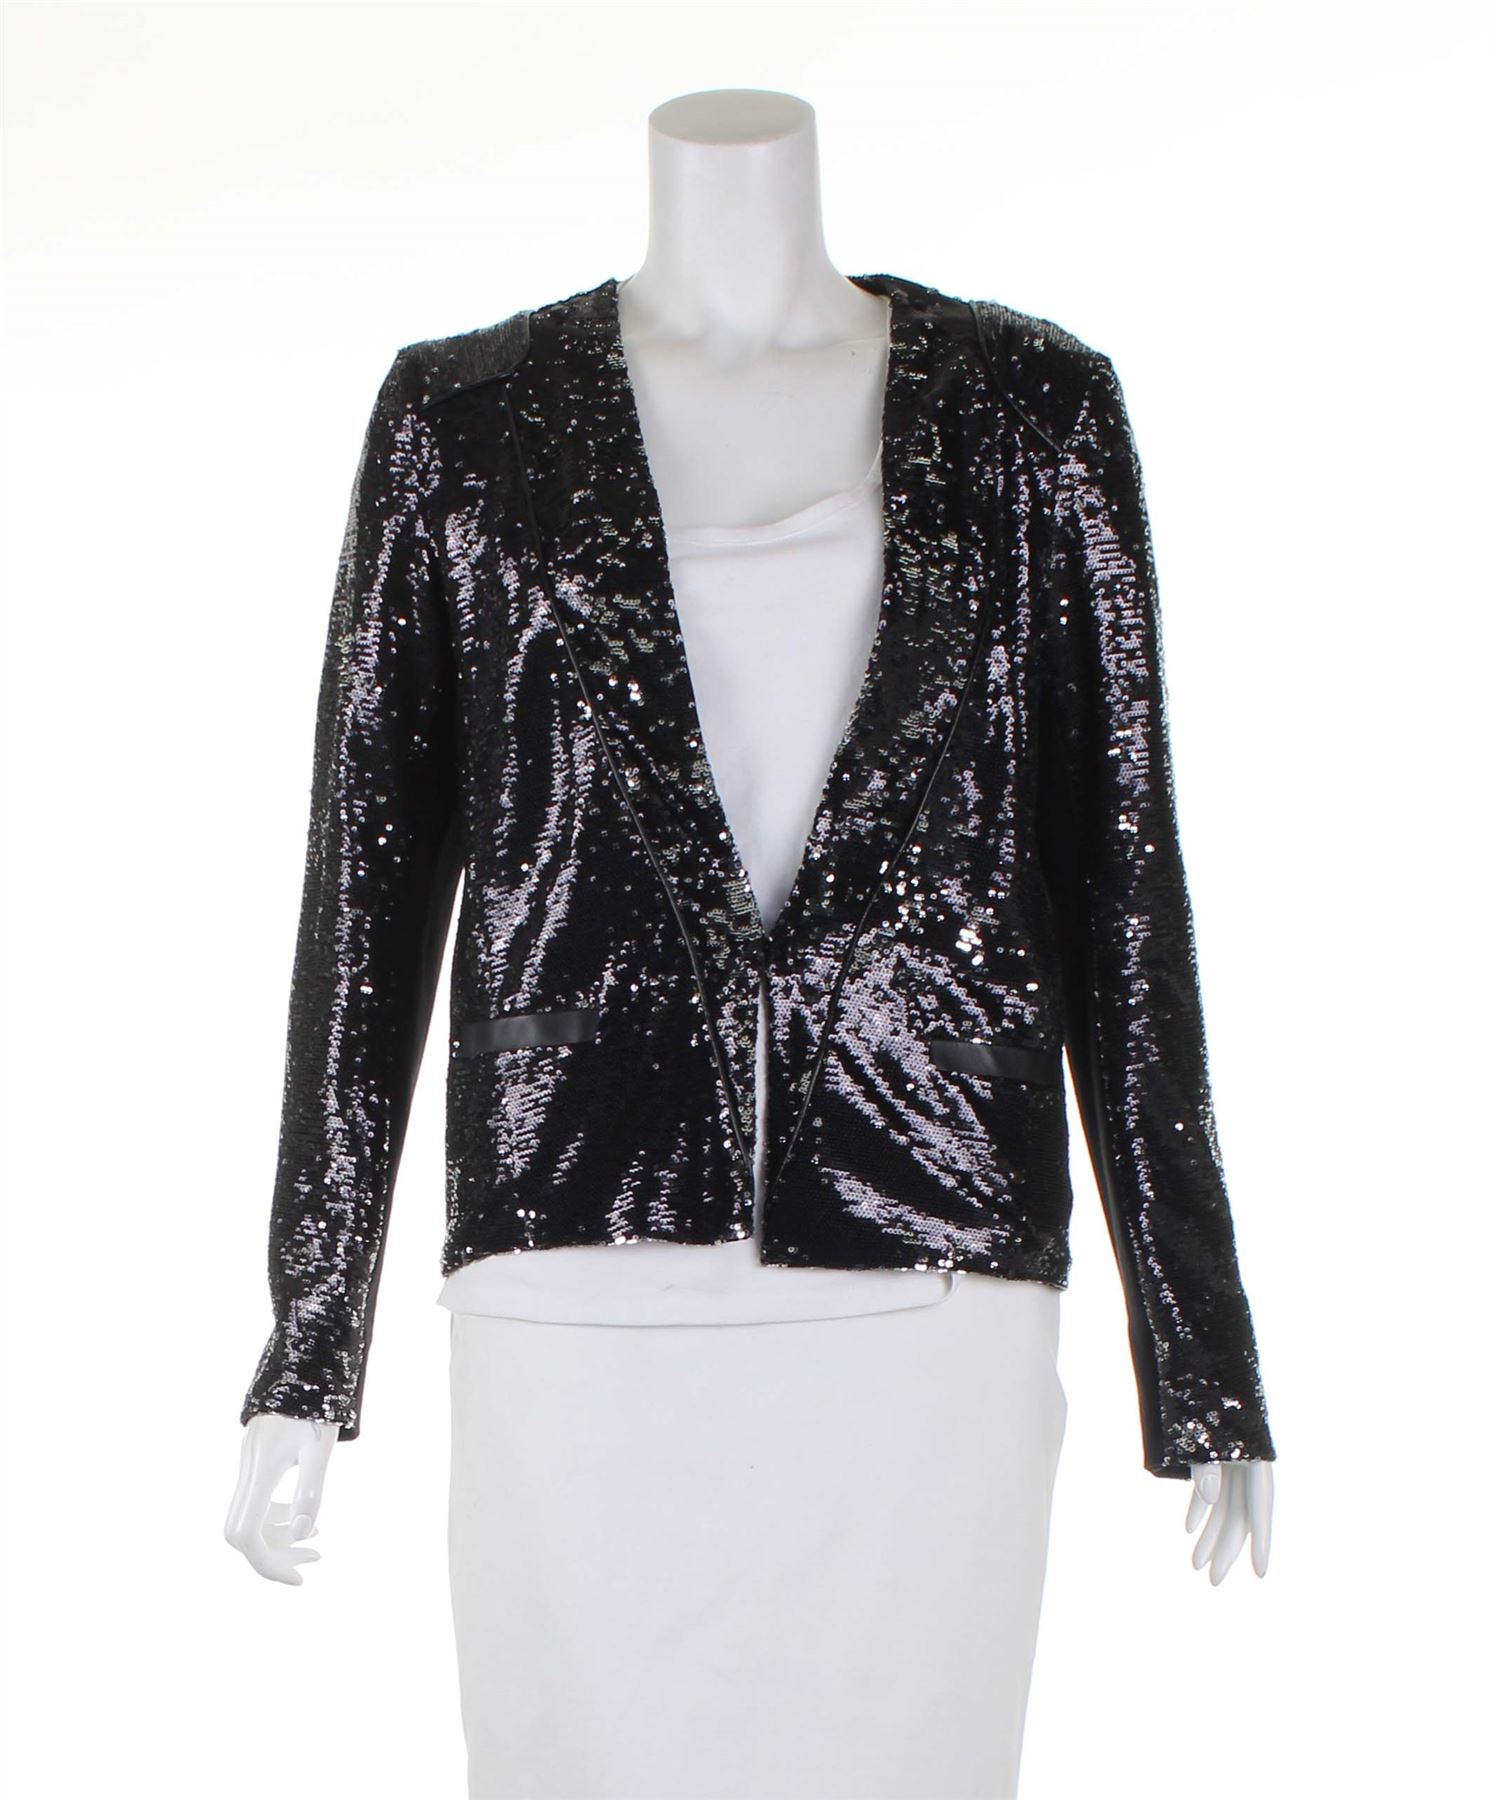 3598e9082eade MAJE Veste Polyester Glitter Blazer noir, UK 10 US 6 EU 38 | eBay